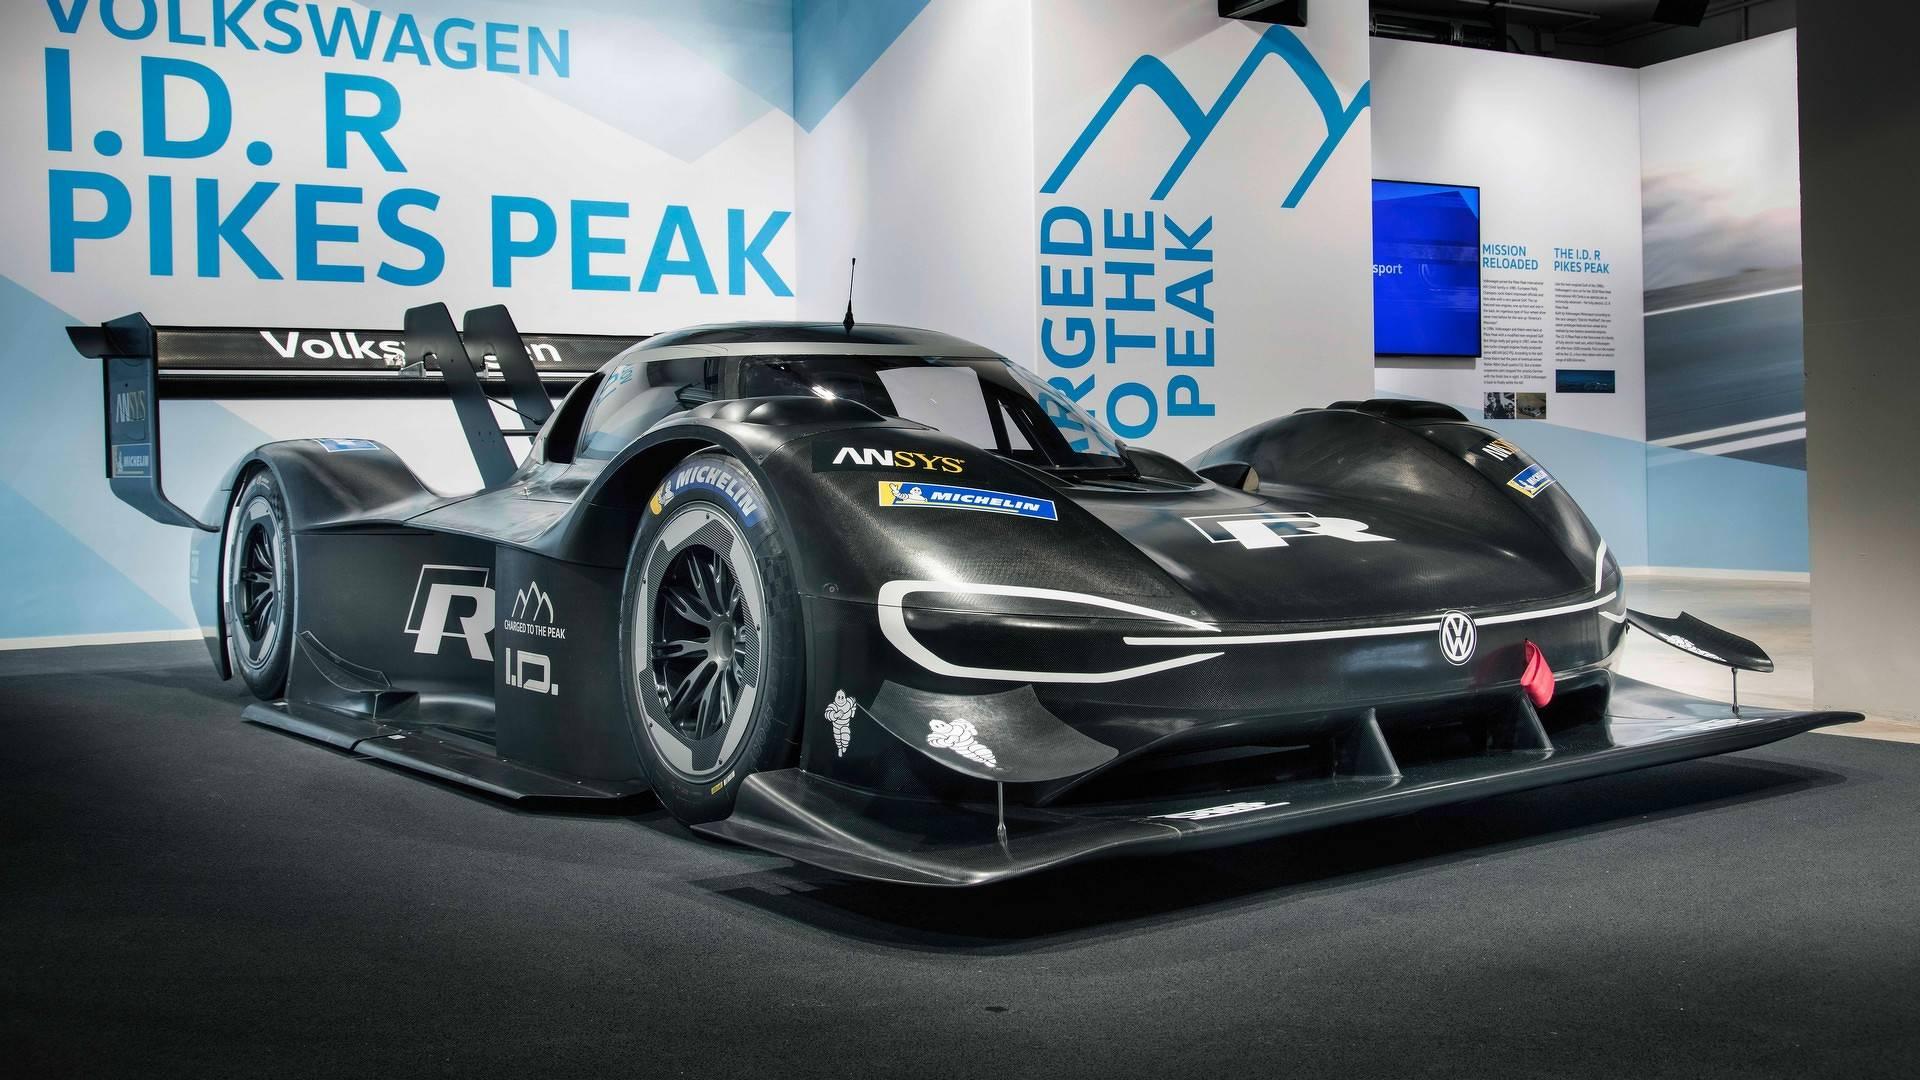 Volkswagen I.D. R Pikes Peak spreman za napad na rekord (VIDEO)